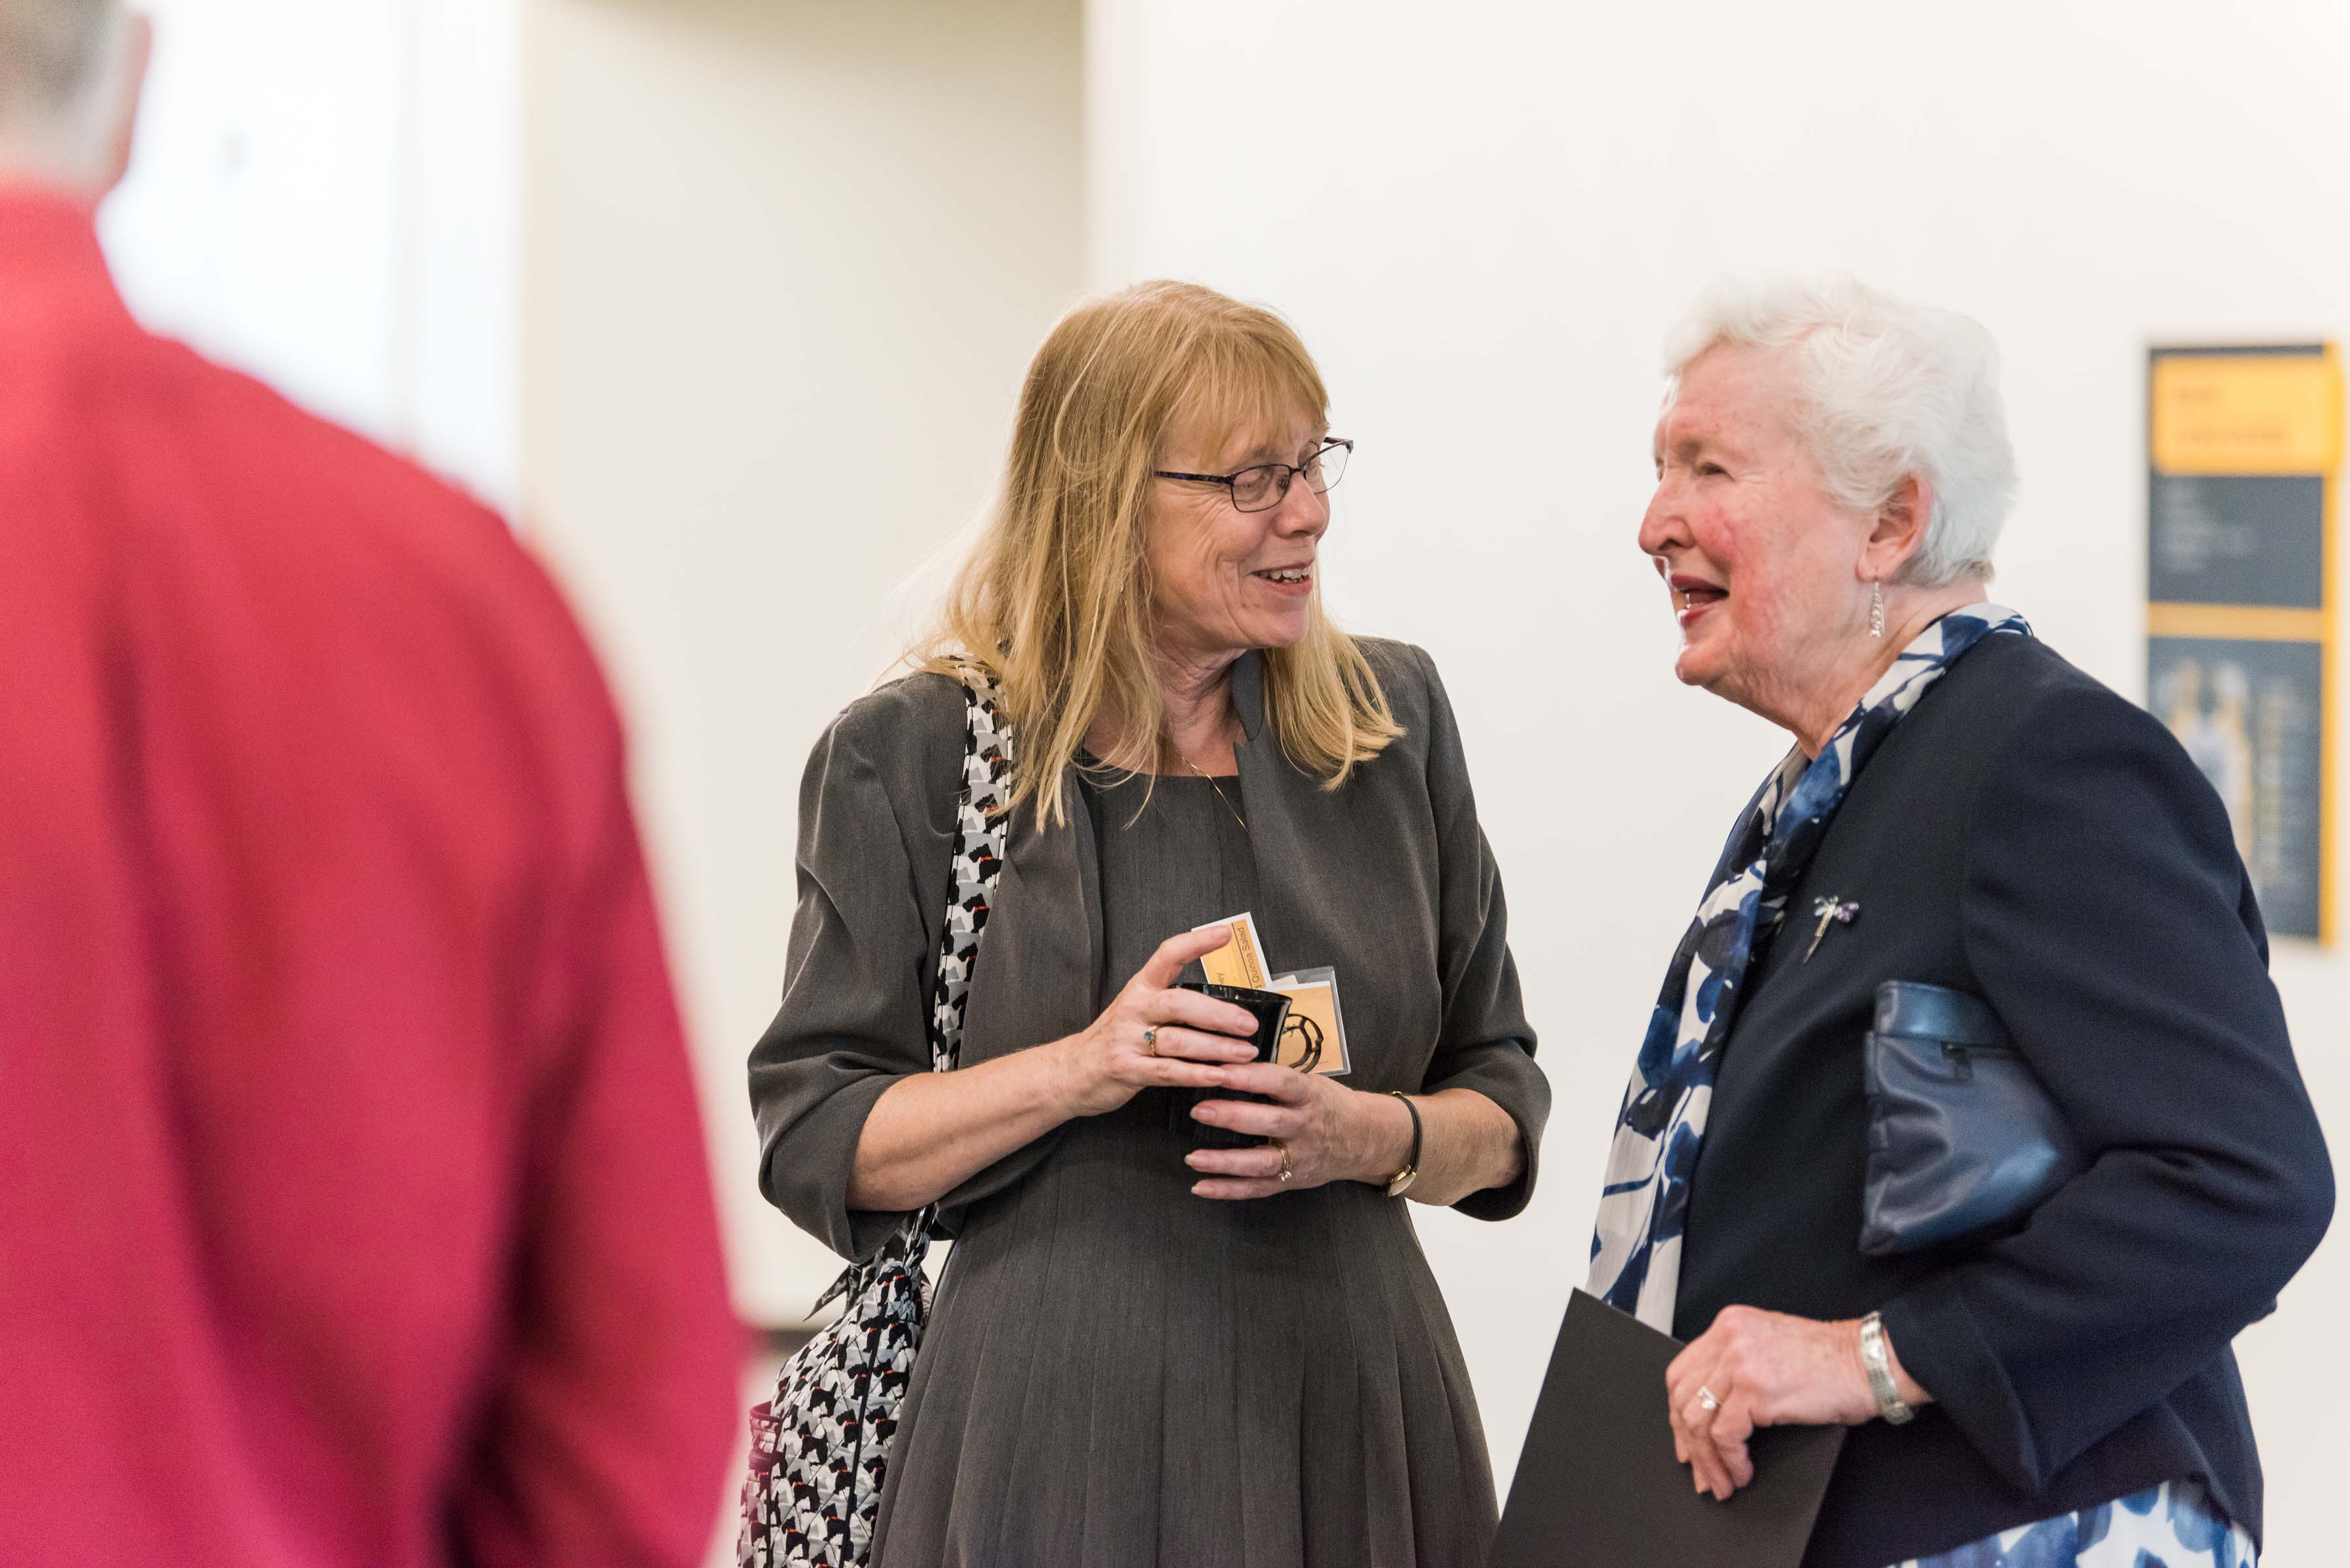 Two women talking at Wisdom Institute lunch